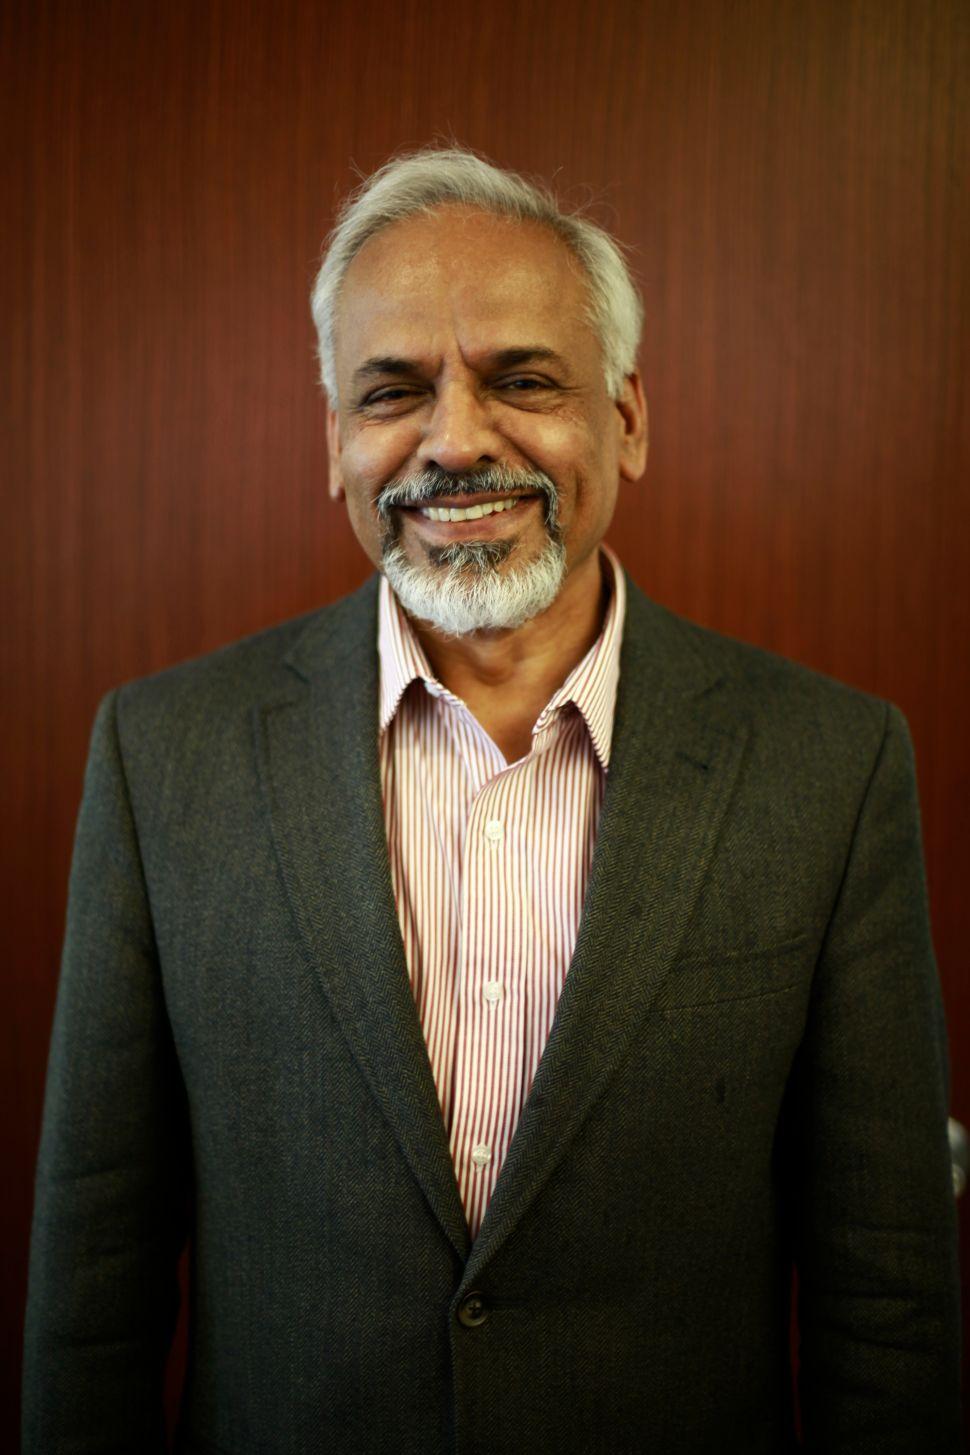 K. R. Sreenivasan